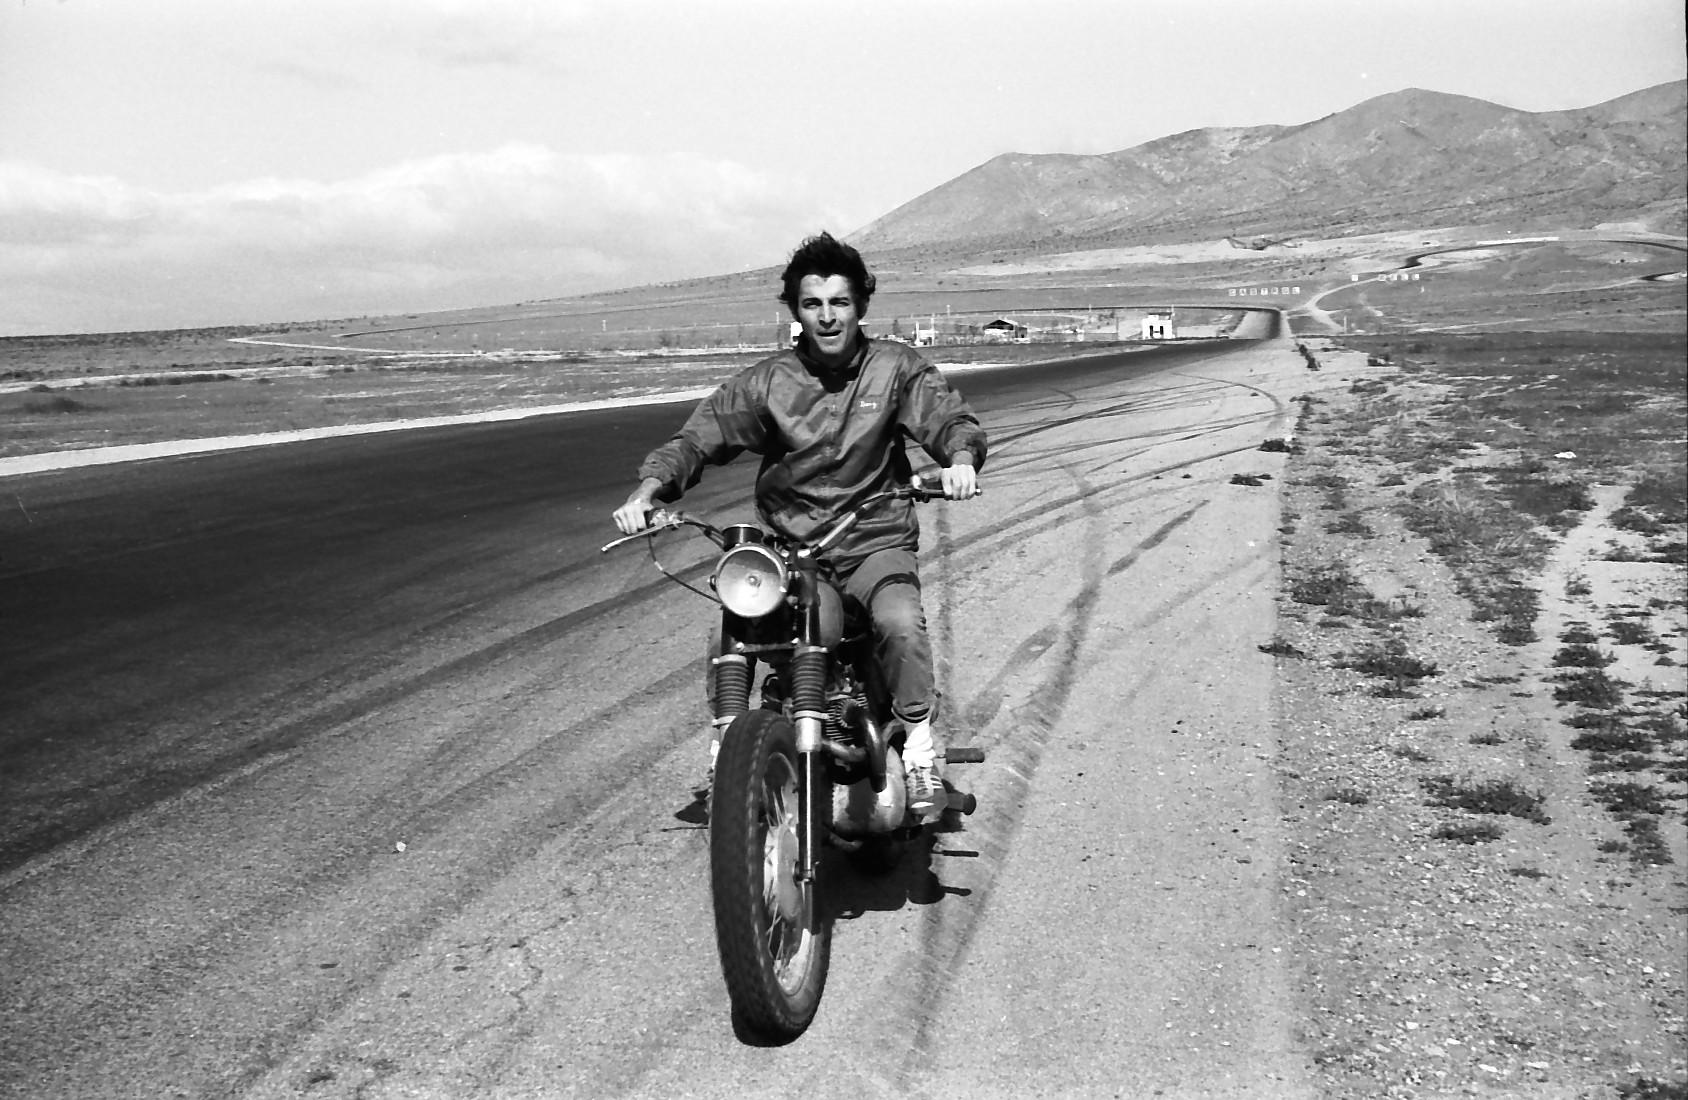 Douglas at Willow Springs circa 1969